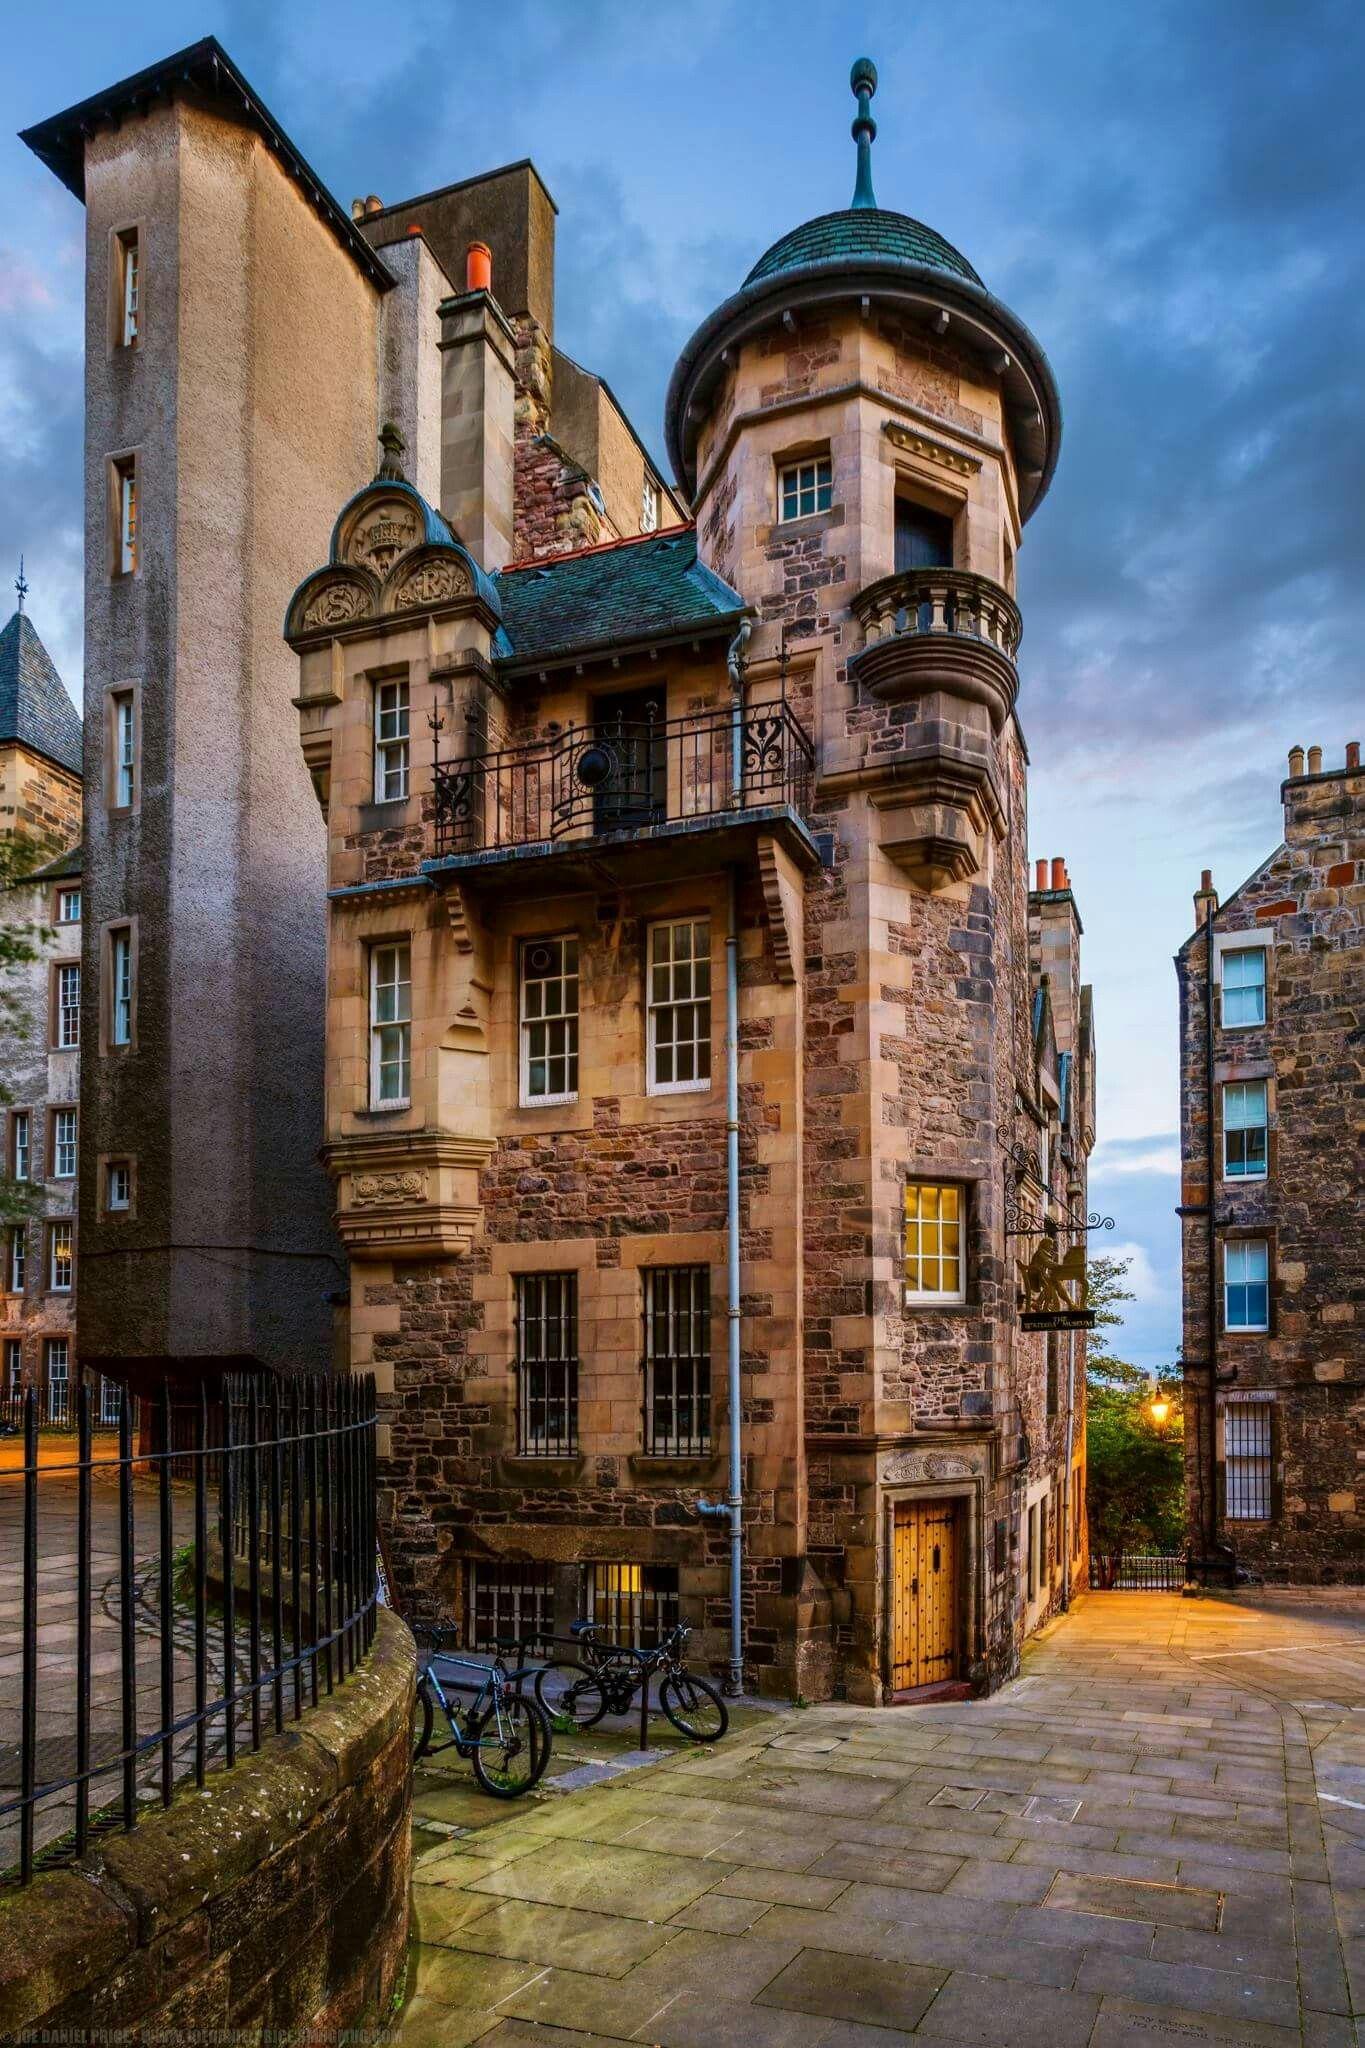 Museu dos escritores Edimburgo, Escócia Places I want